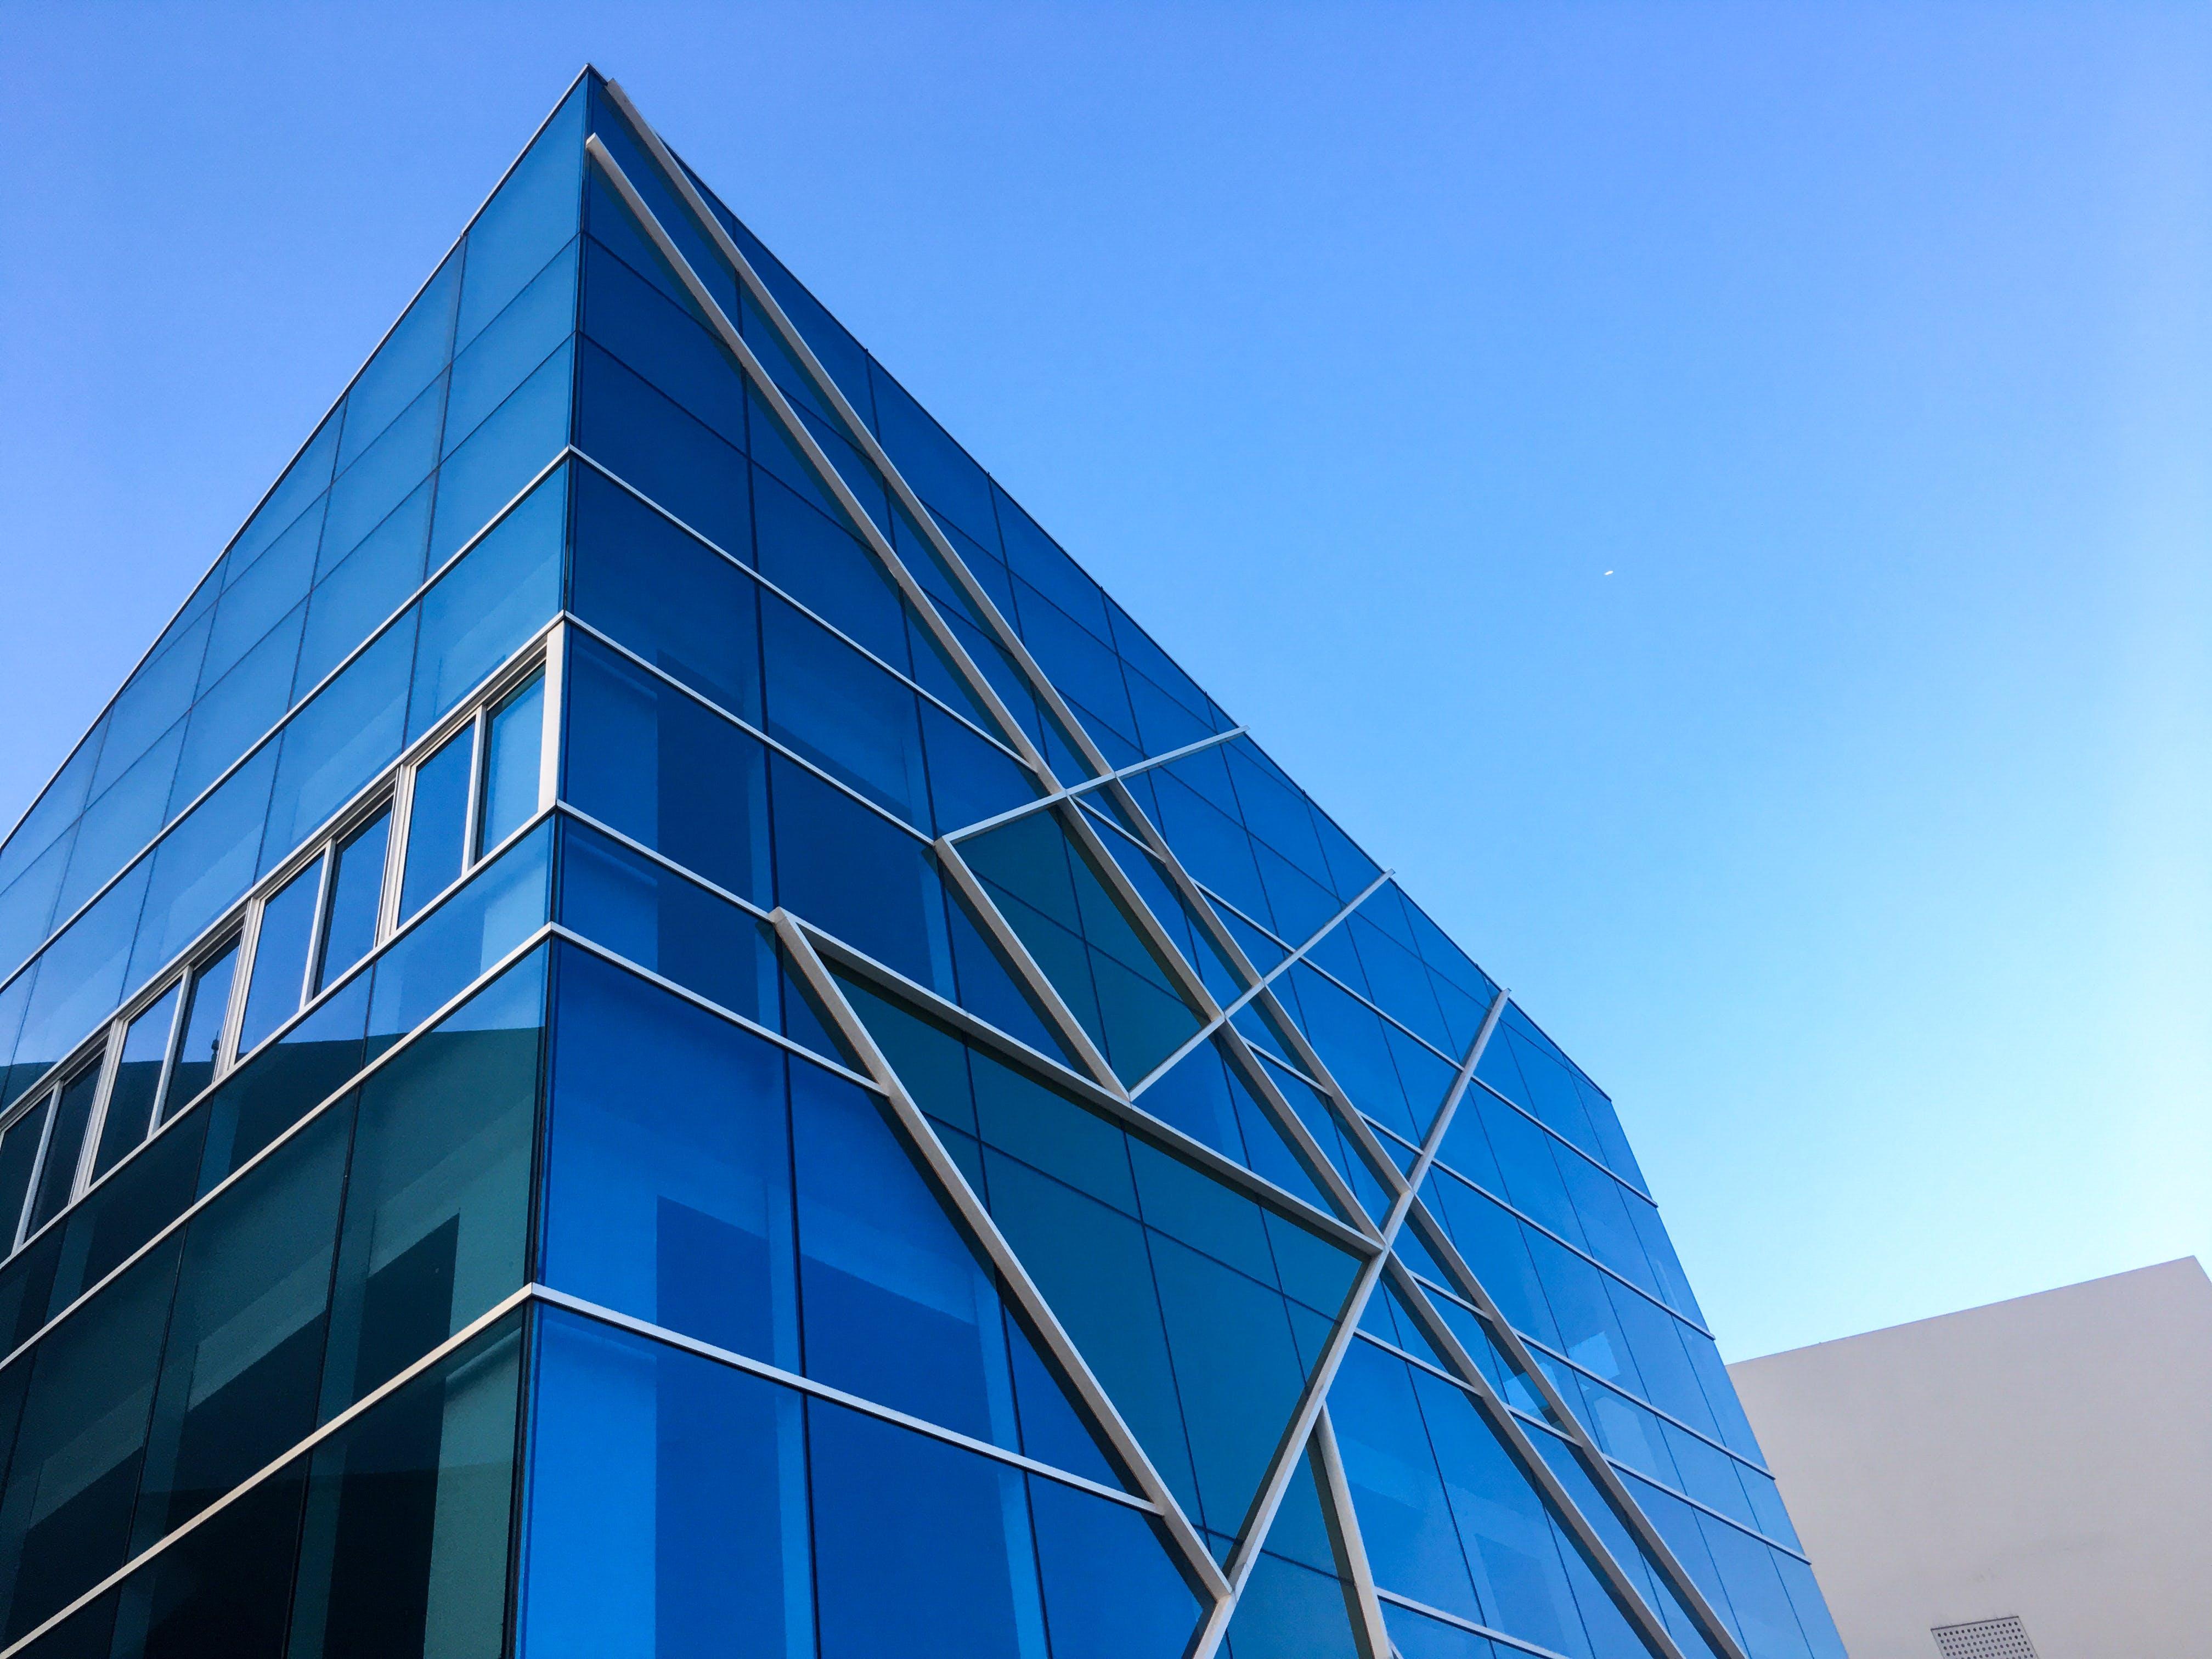 Gratis lagerfoto af arkitektdesign, arkitektur, blå himmel, byggeri